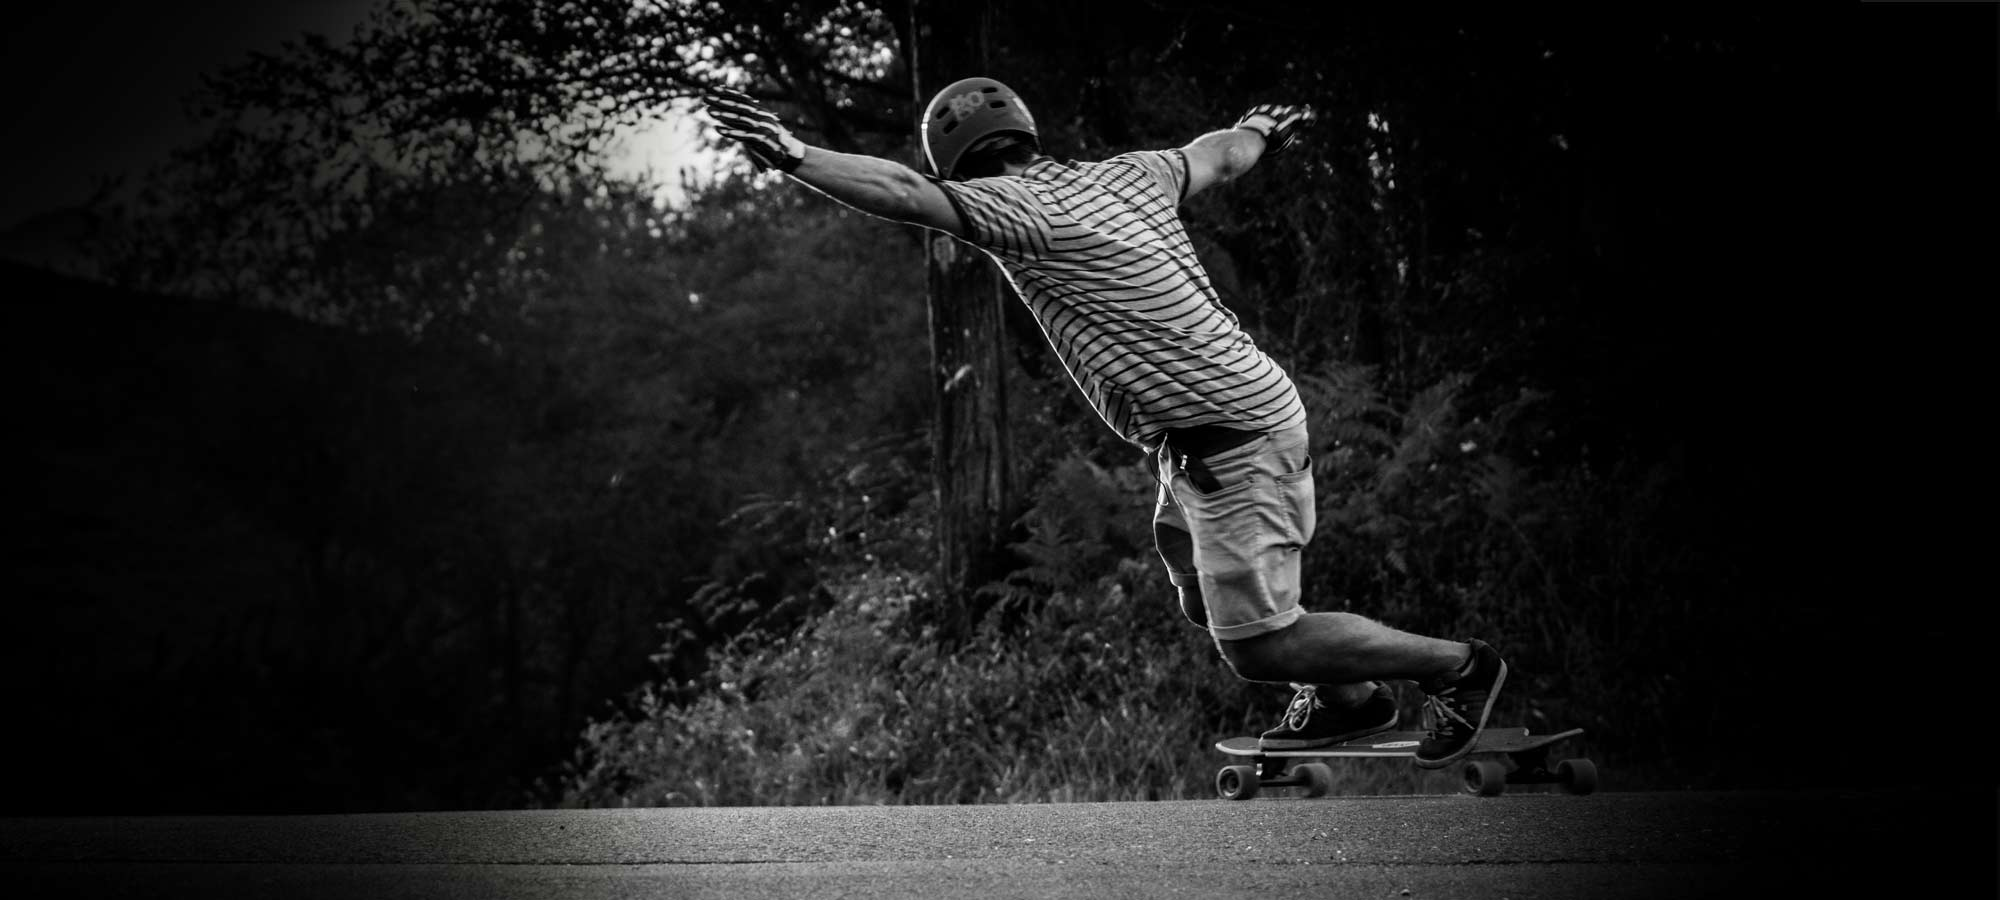 borja allúe rider patinando la tabla montada cruising longboard bamboo elude goatlongboards